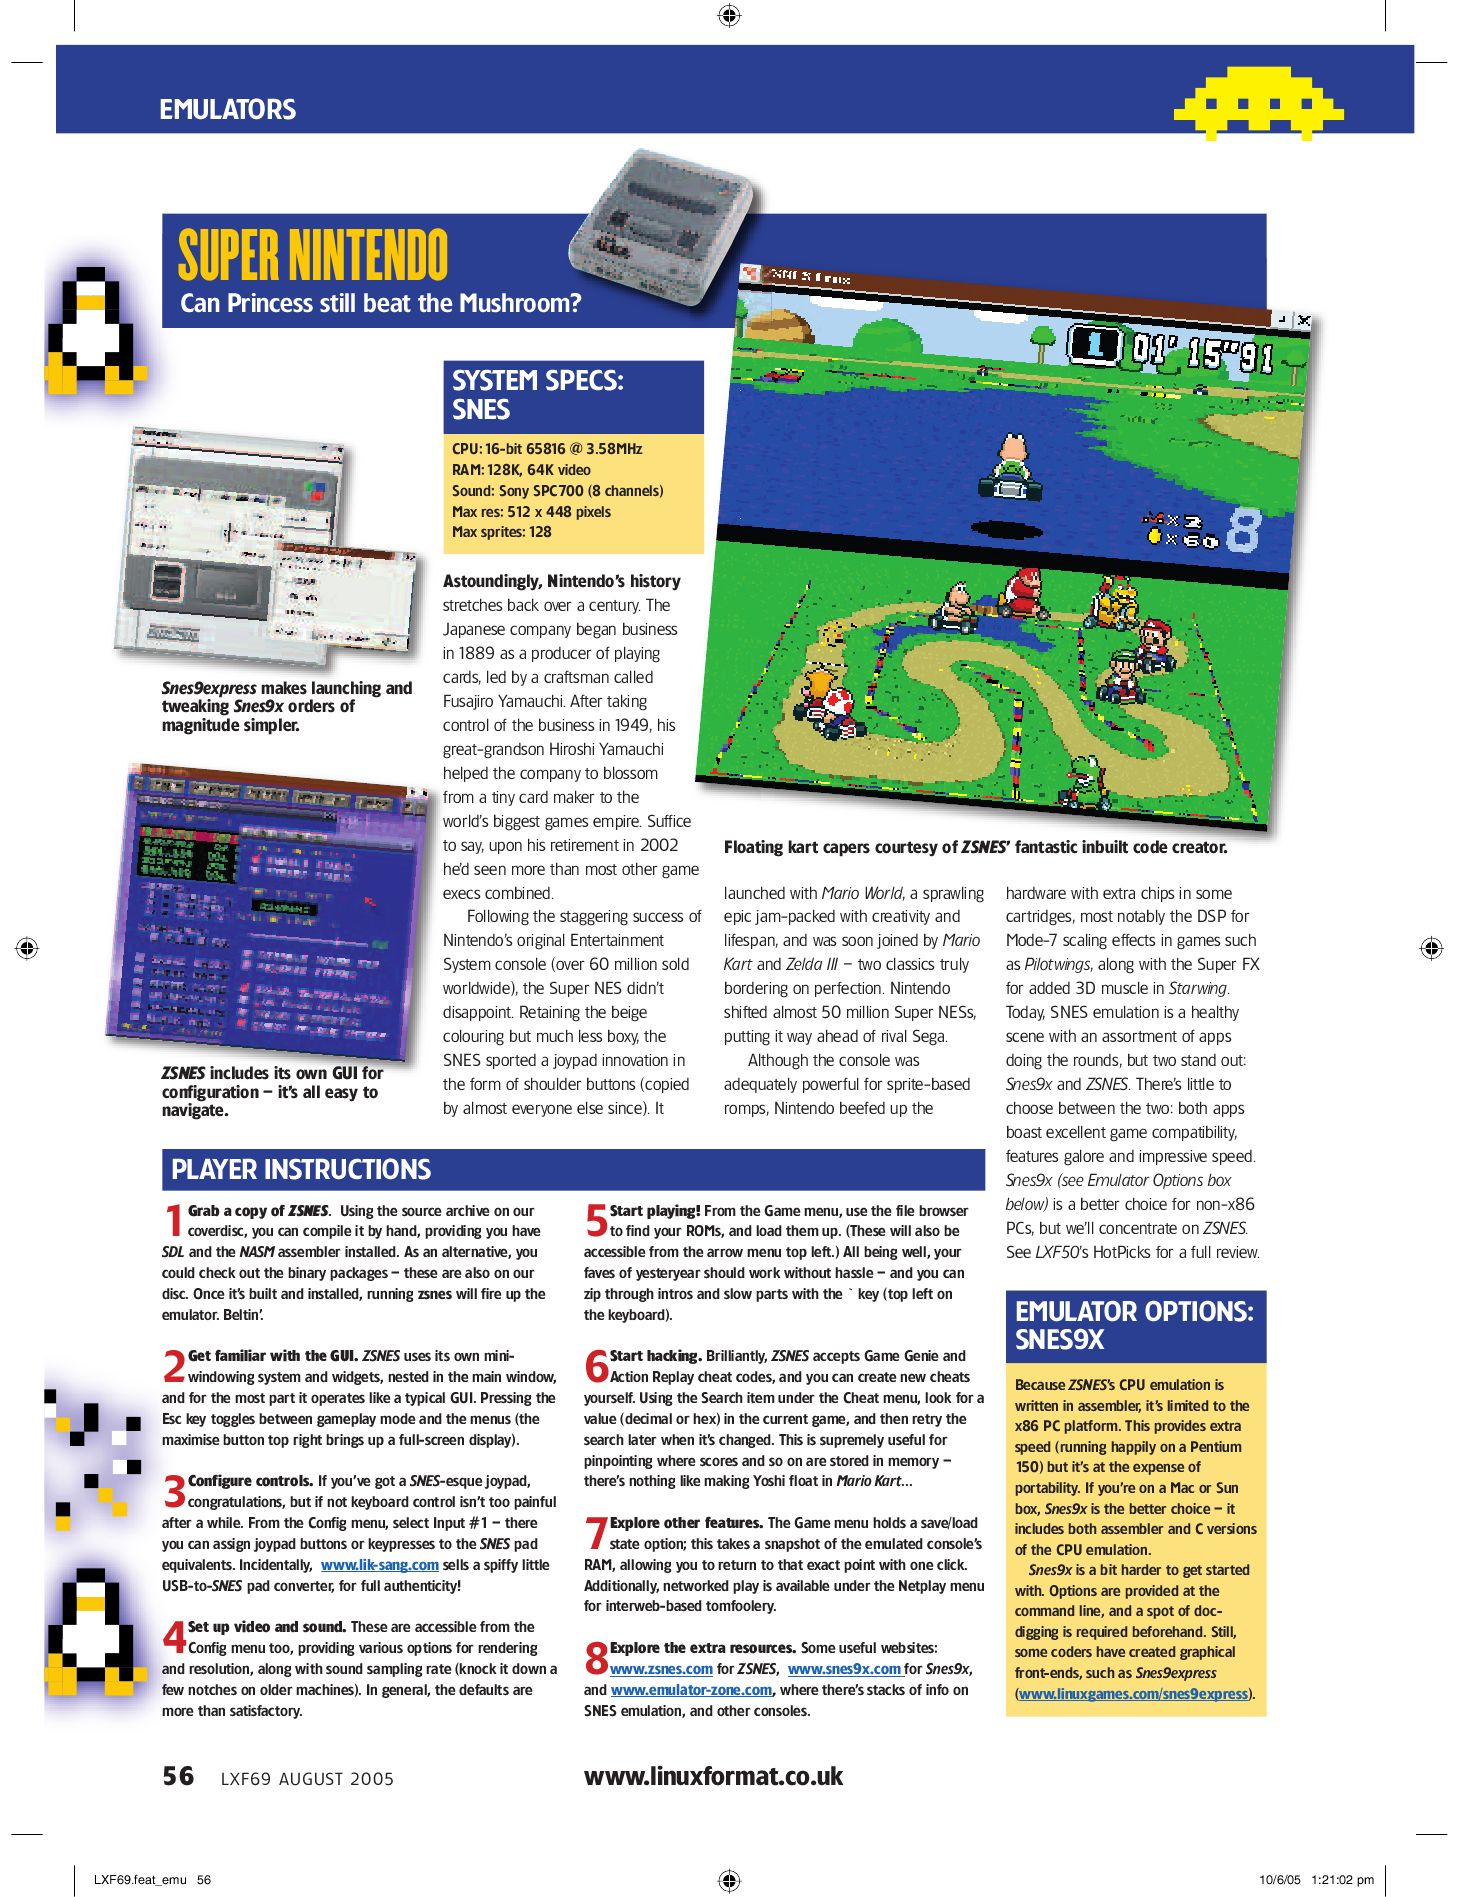 Linux Format 69 feat_emu by Herbert de Carvalho - issuu